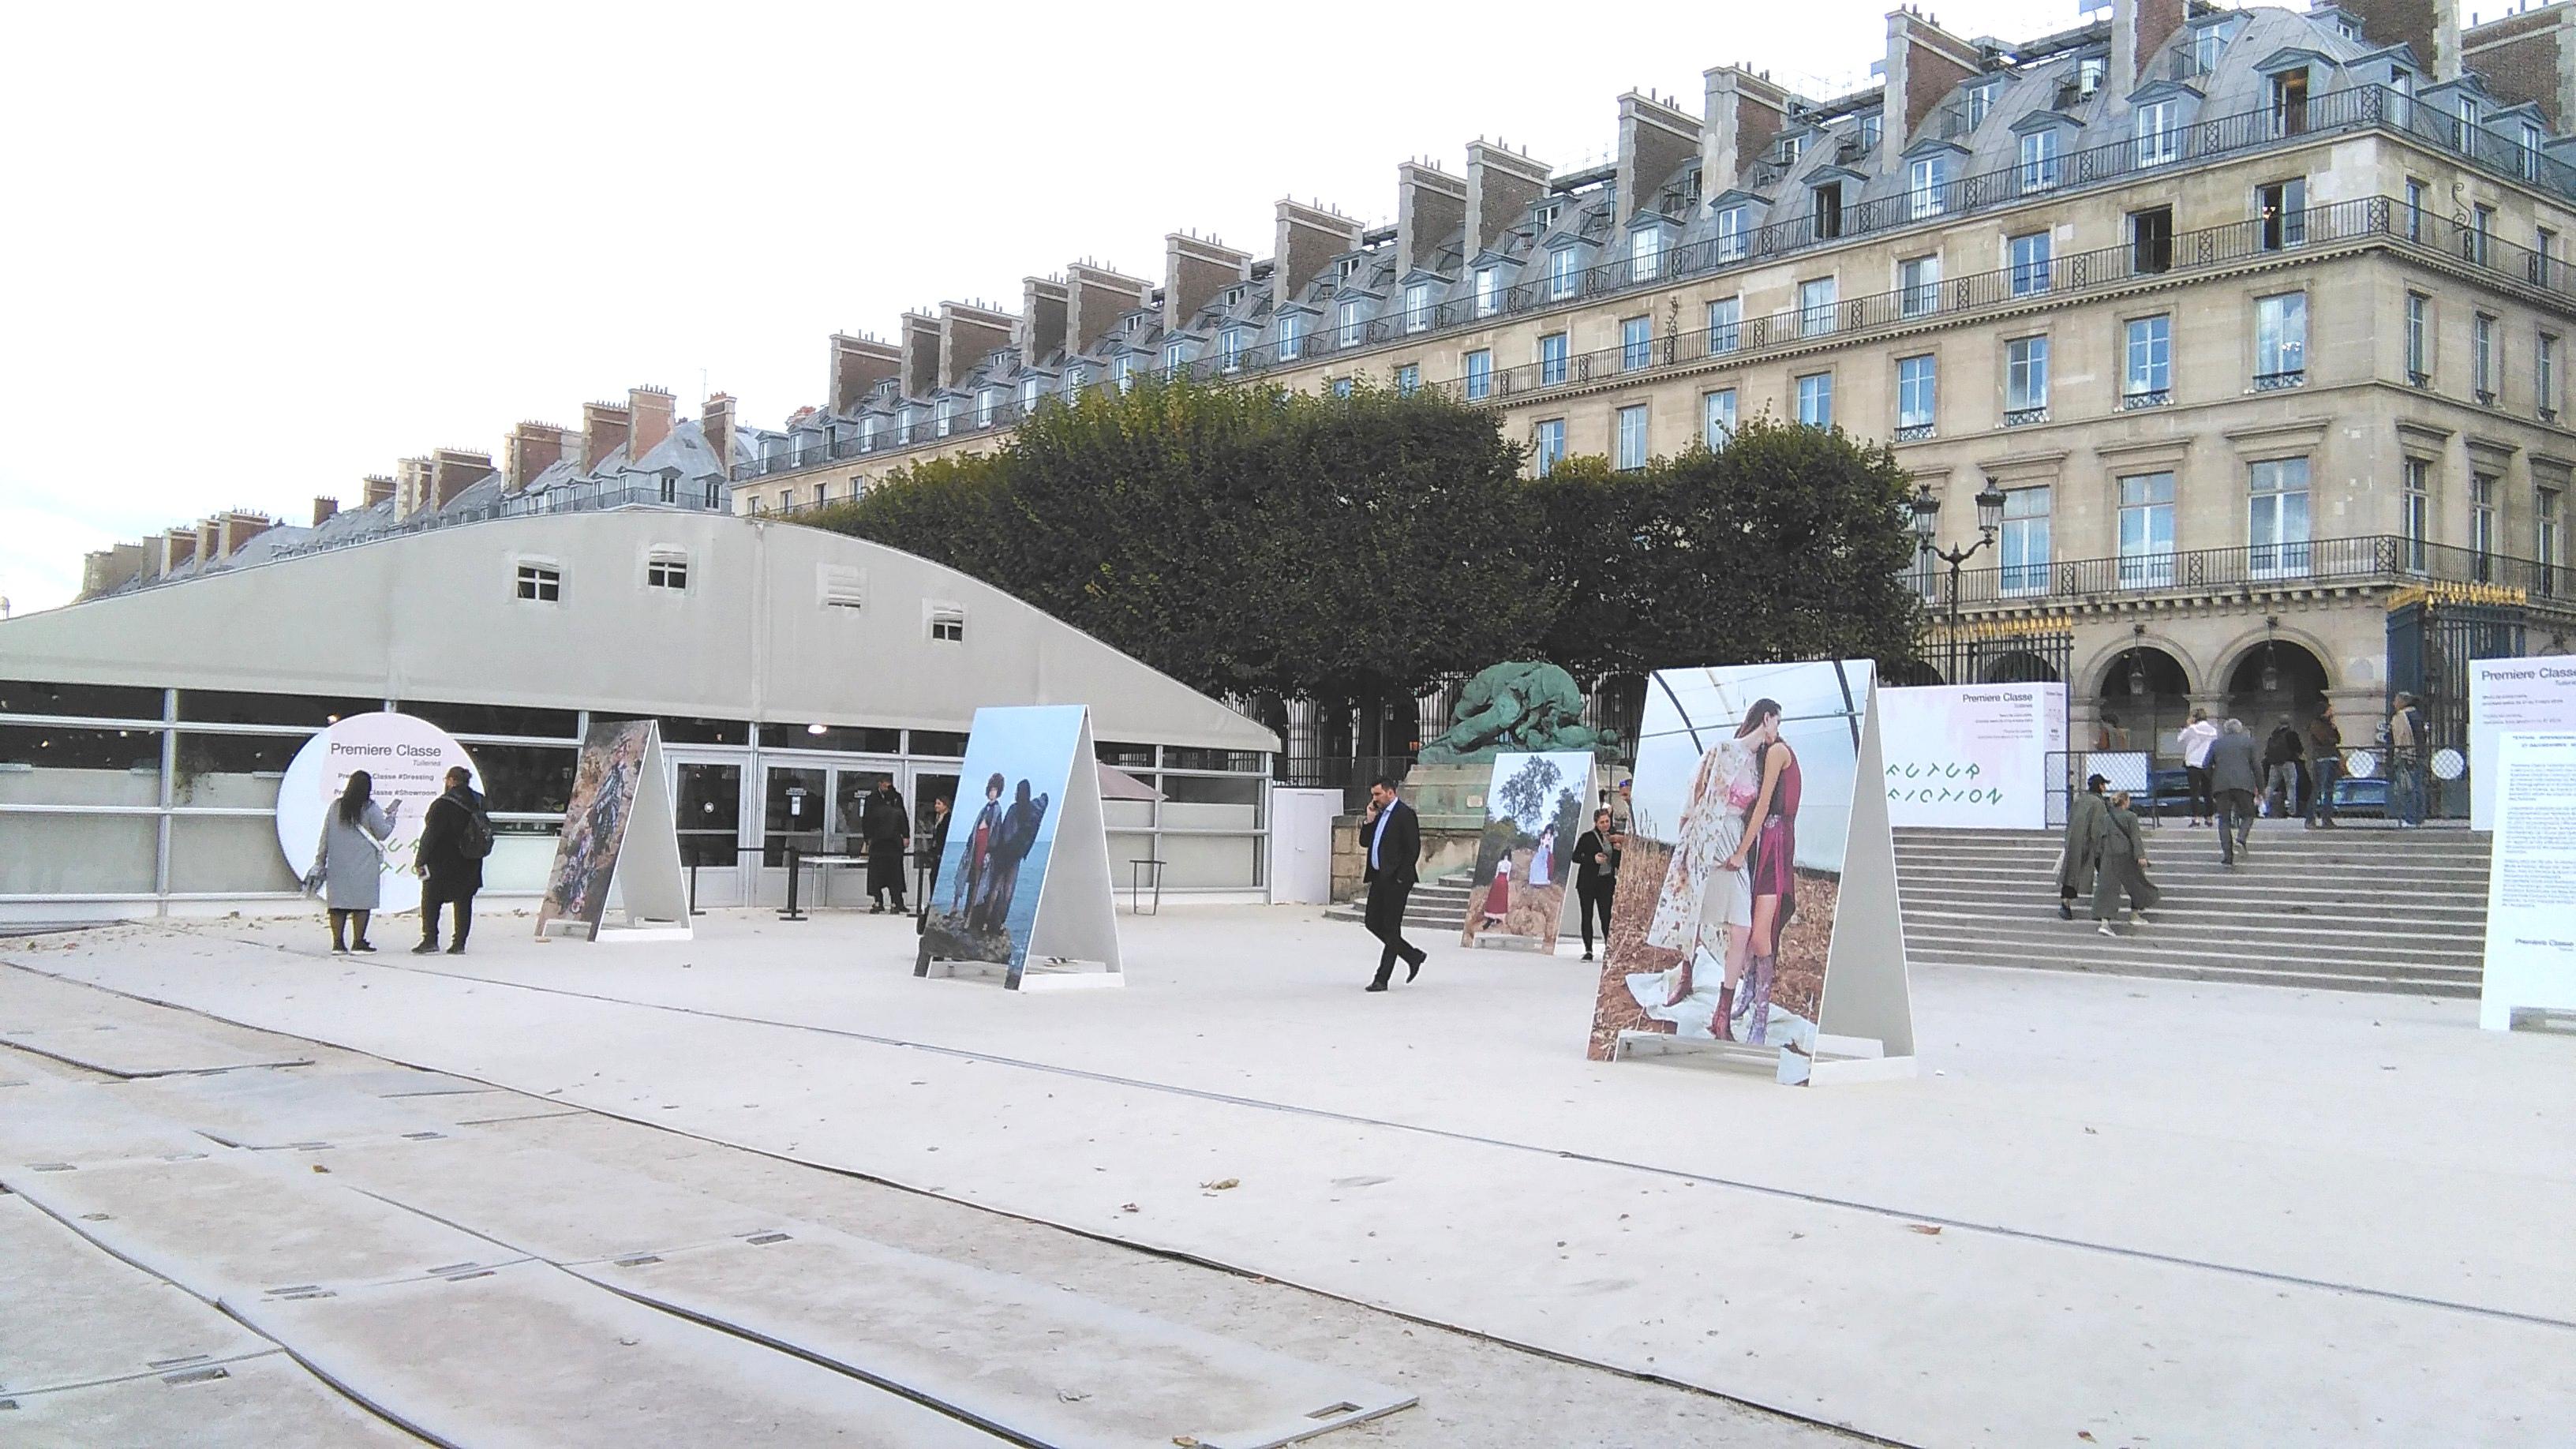 NEW EVENT: Premiere Classe Tuileries PARIS